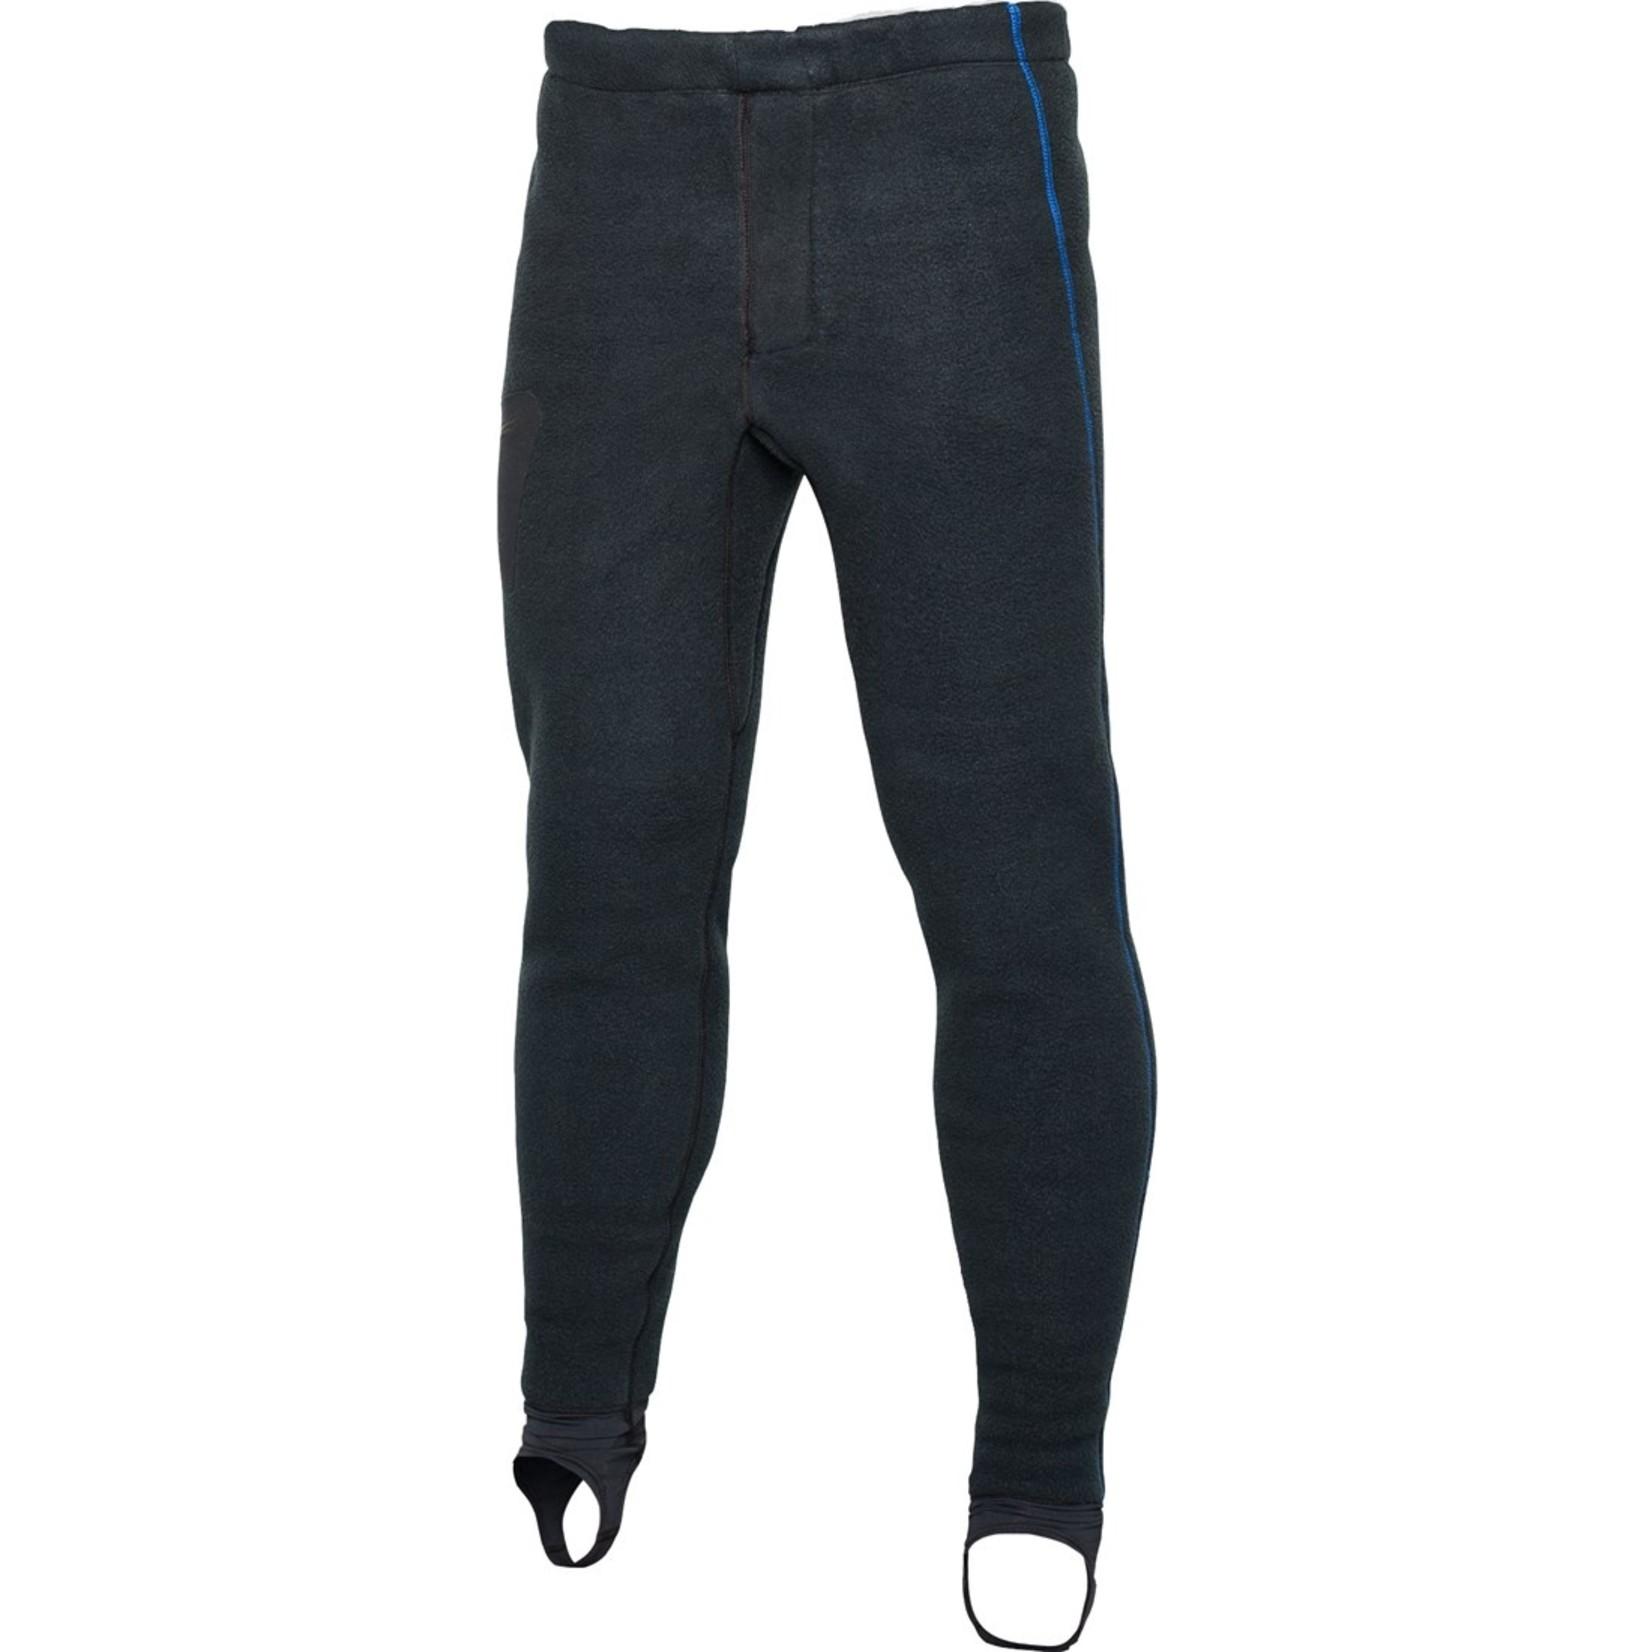 Bare SB System Mid Layer Pant - Men